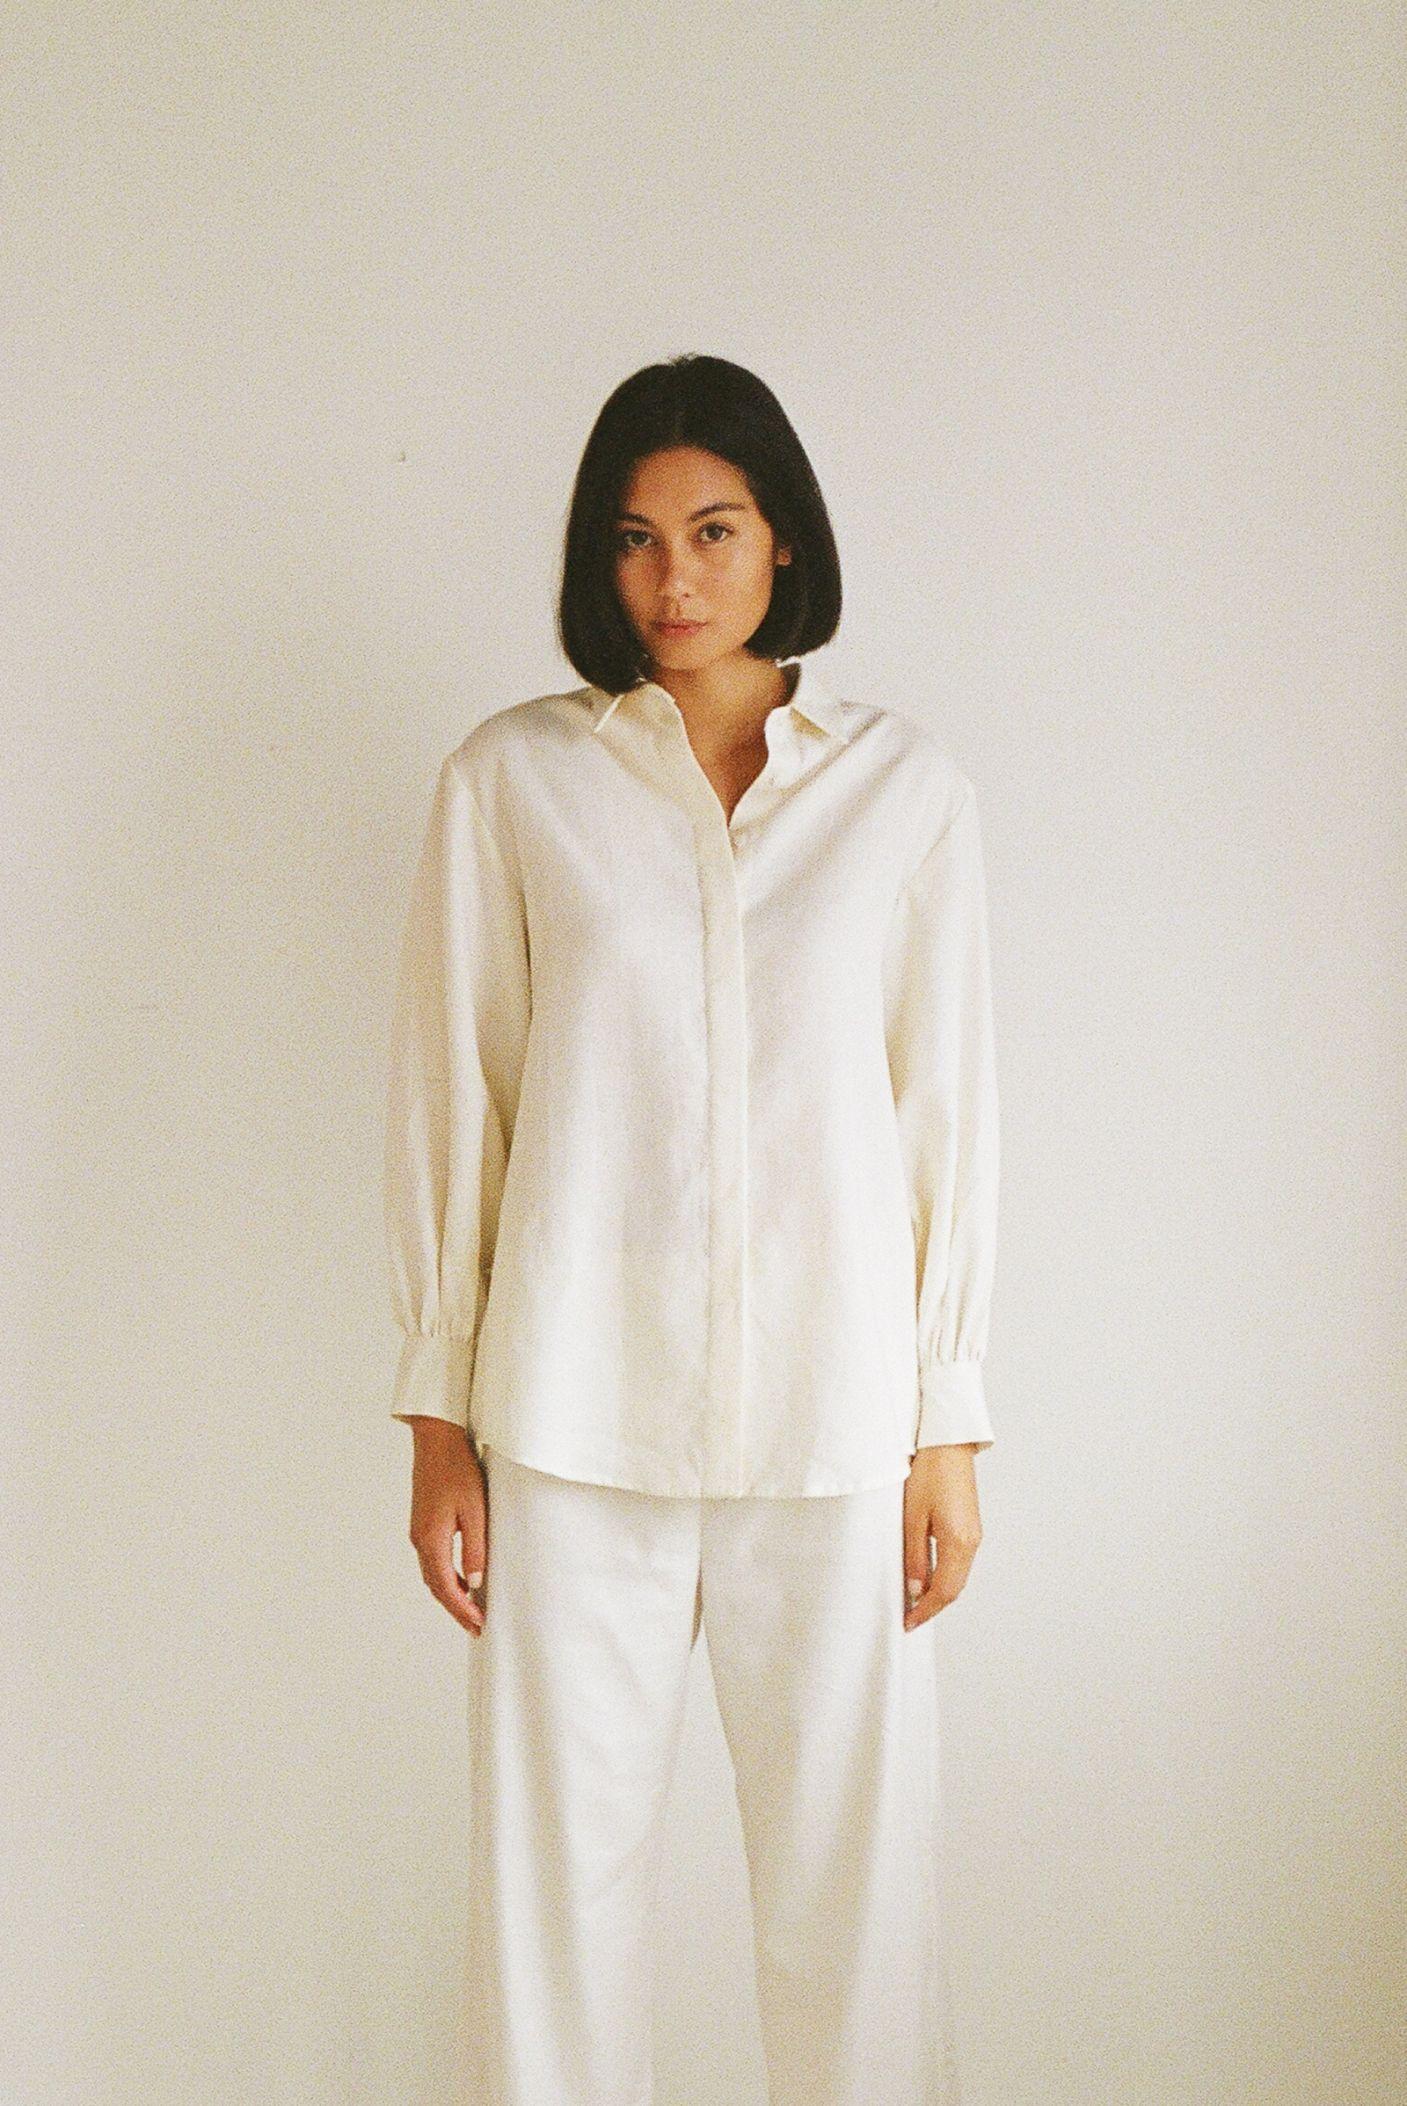 Mes shirt Ivory - Ellis Label - Linen - New Zealand clothing_0028_83090018